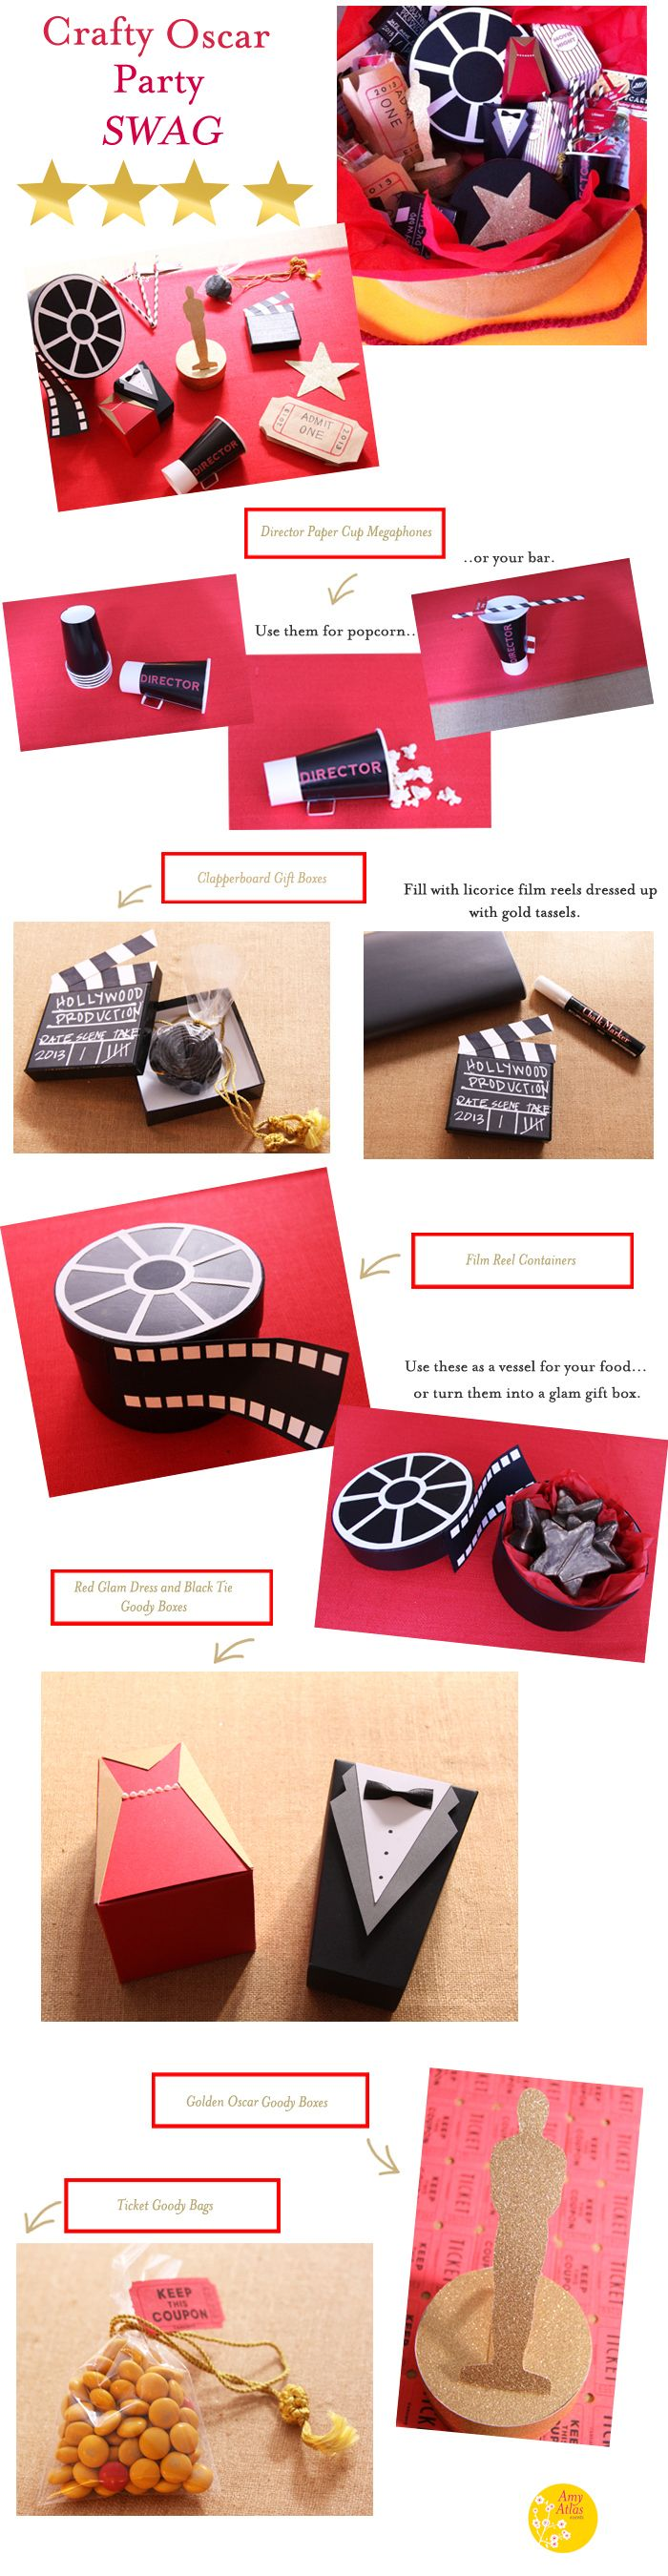 Birthday gift bags 5 cooking for oscar - Crafty Oscar Party Gift Bag Ideas